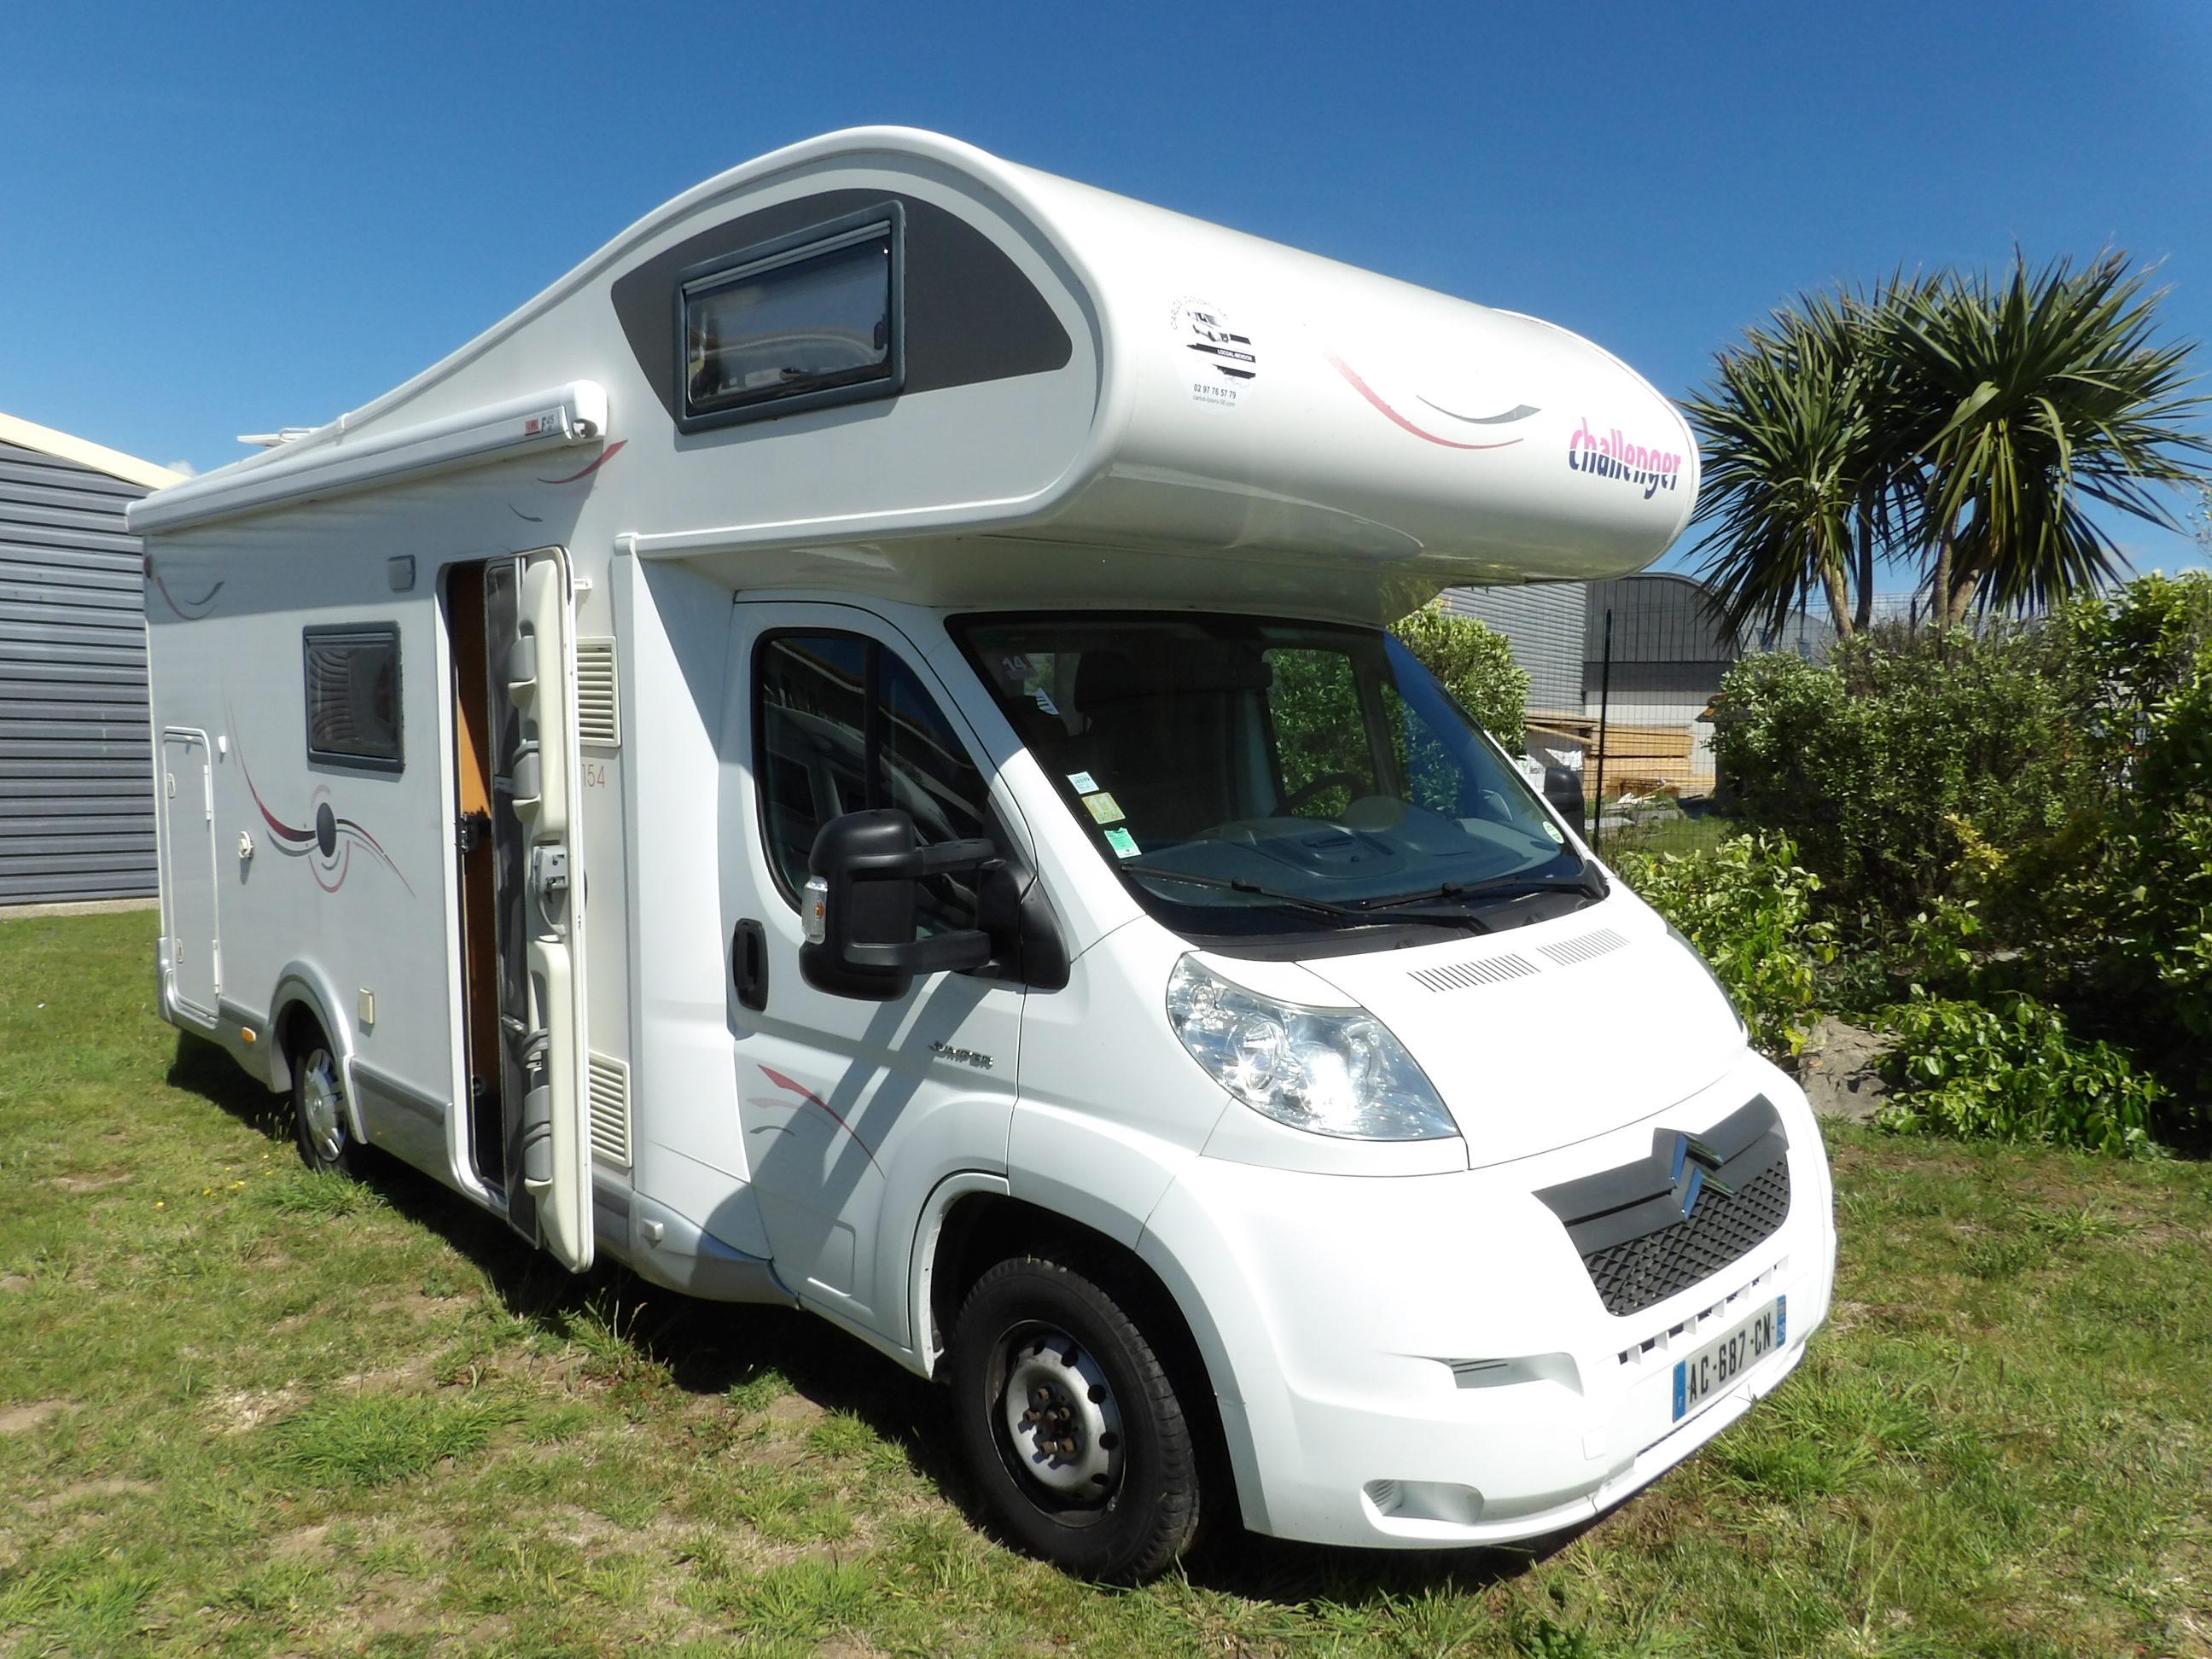 challenger mageo 154 occasion de 2009 citroen camping car en vente locoal mendon sortie 36. Black Bedroom Furniture Sets. Home Design Ideas